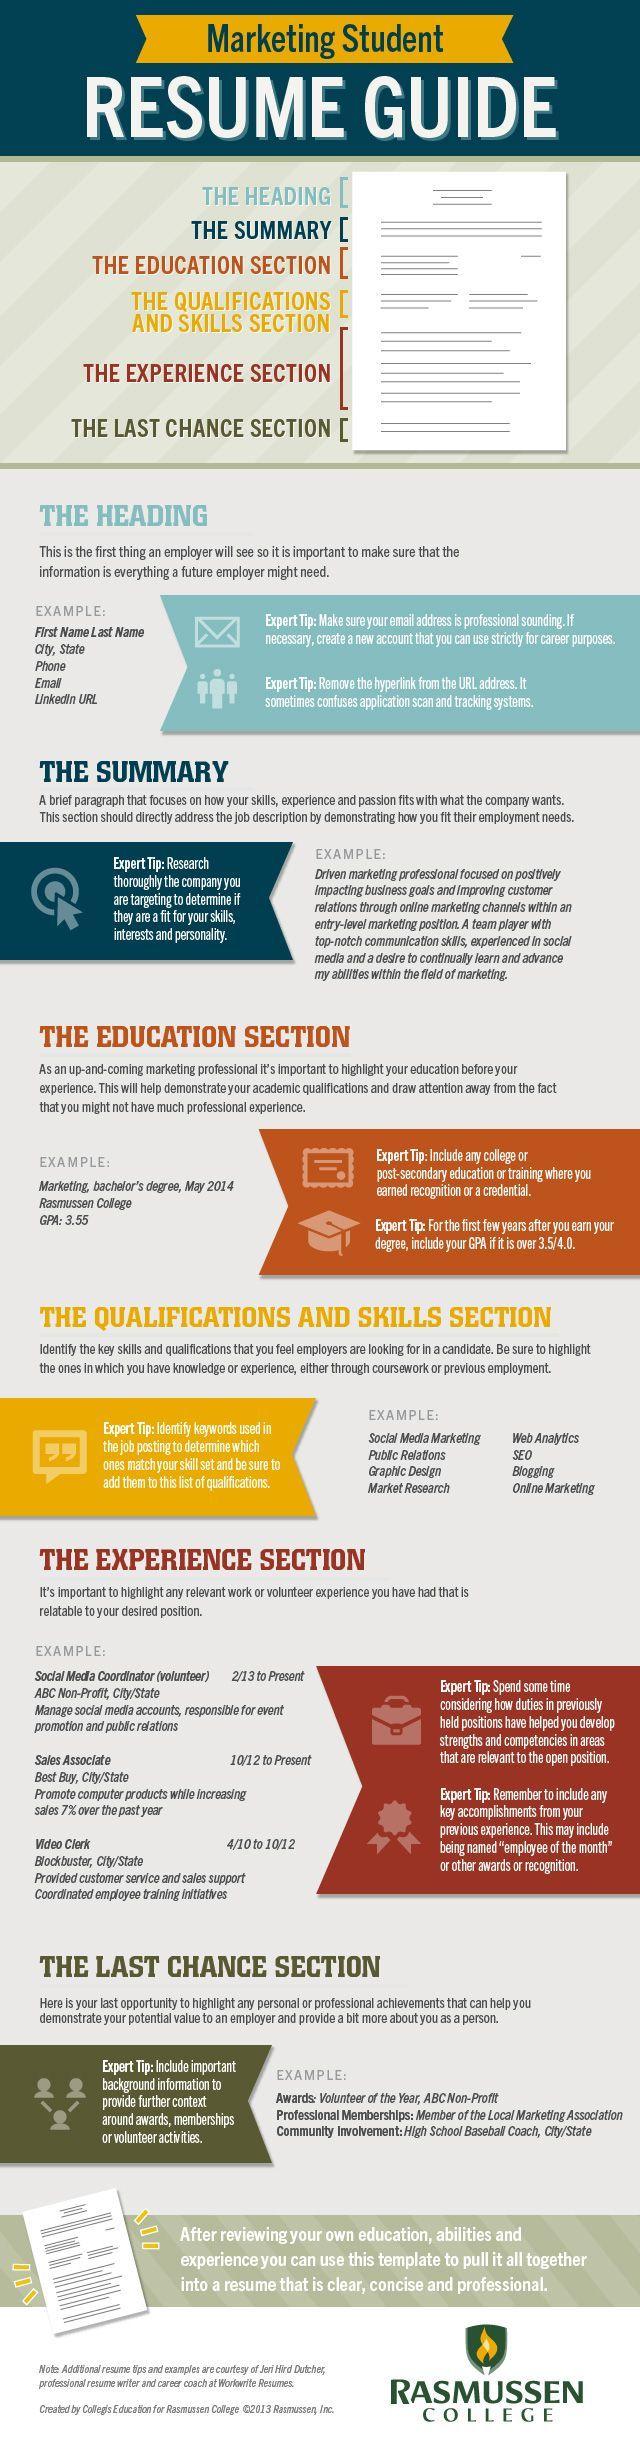 Resume Archives | Career | Pinterest | Busqueda de empleo ...